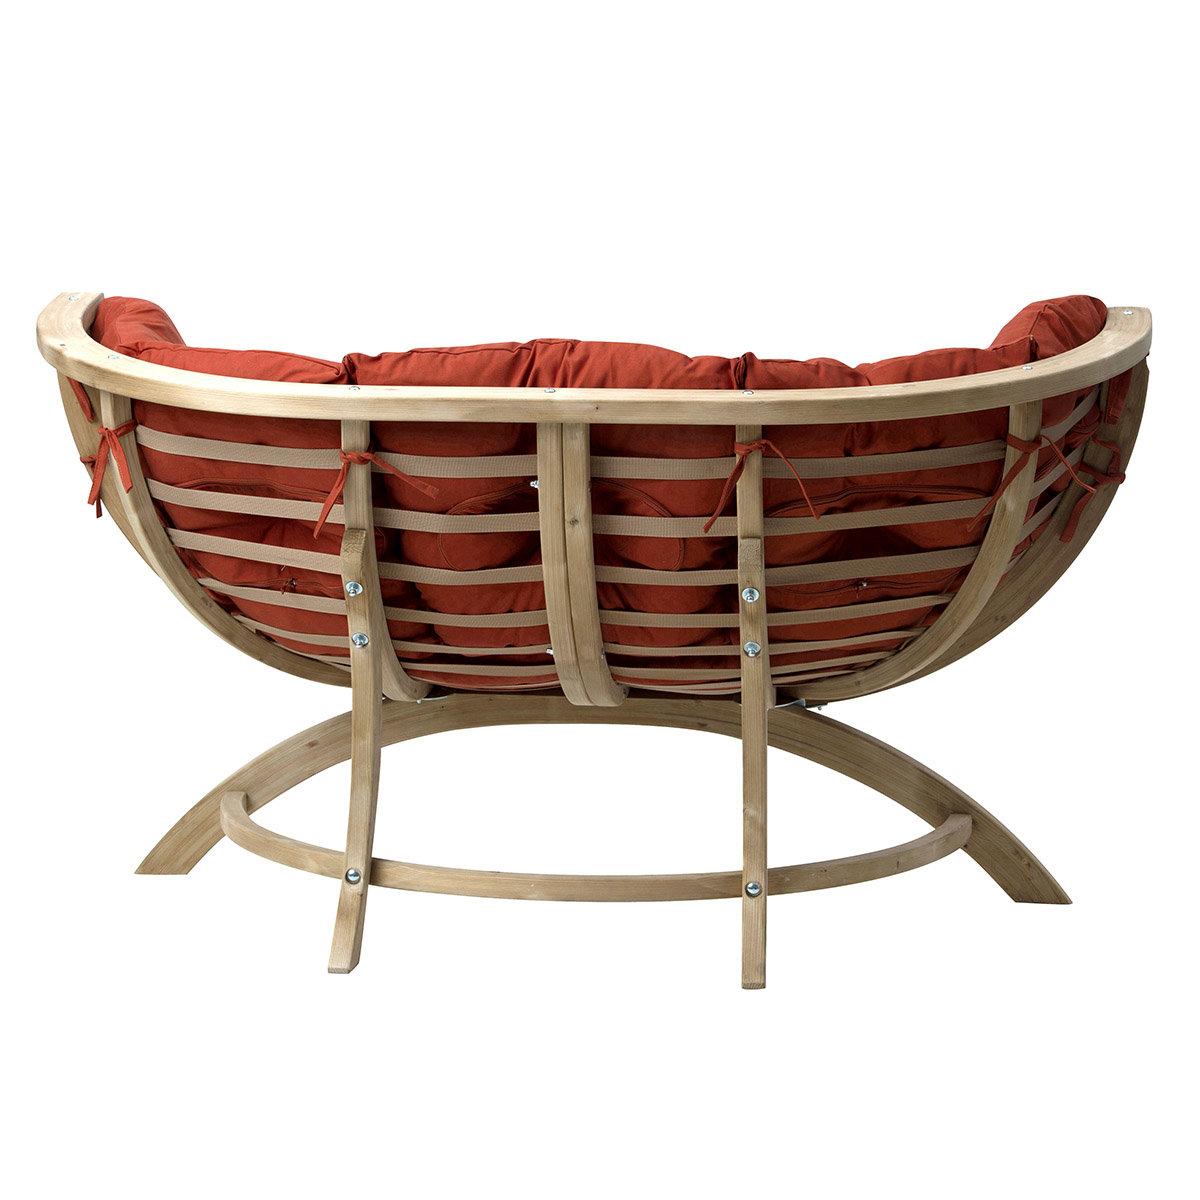 amazonas gartensofa siena due terracotta online kaufen bei g rtner p tschke. Black Bedroom Furniture Sets. Home Design Ideas